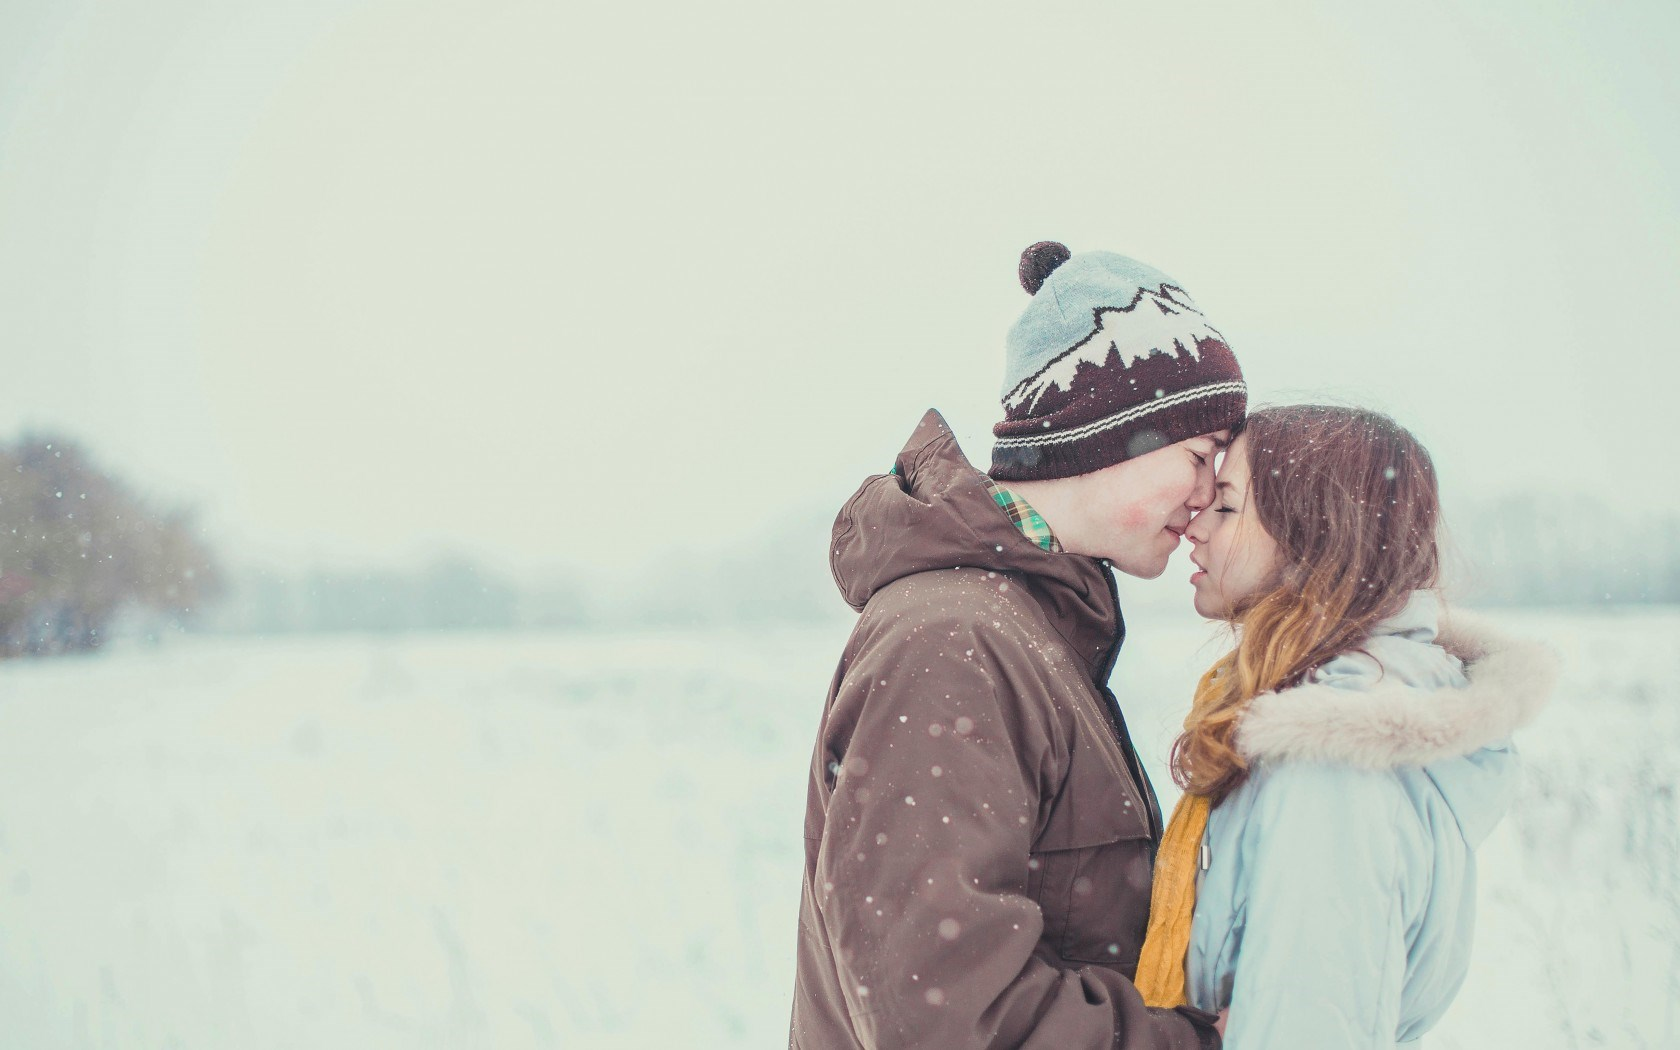 Mood Girl Boy Winter Snow Tenderness Love